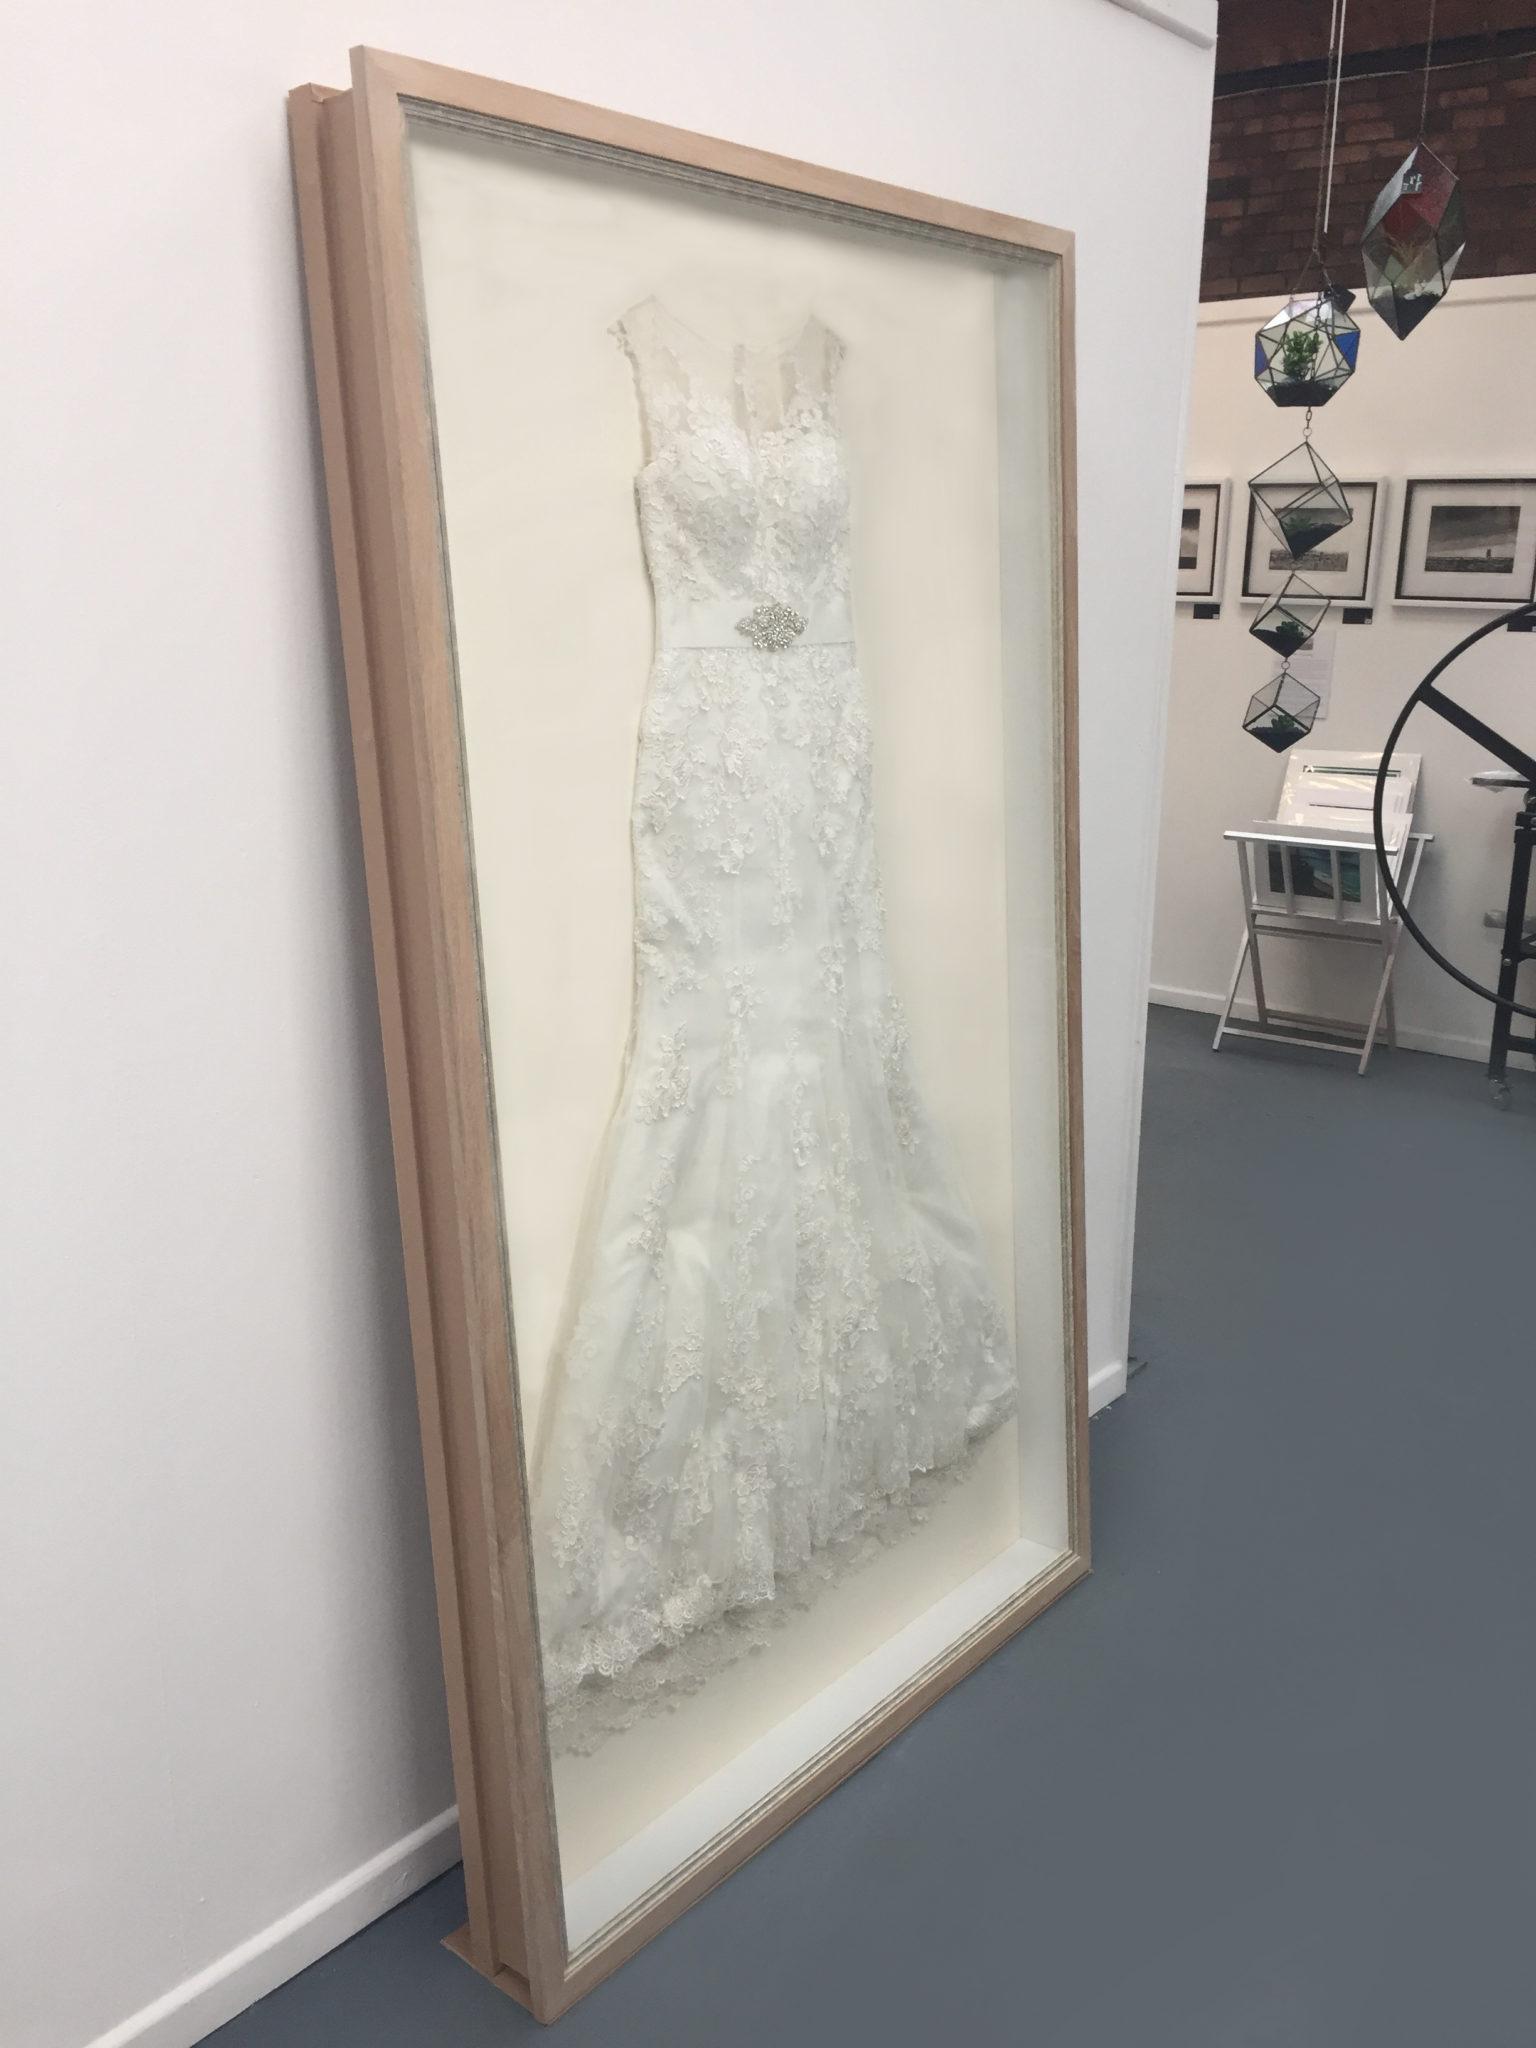 Wedding Dress Framing 3 - Ironbridge Fine Arts & Framing